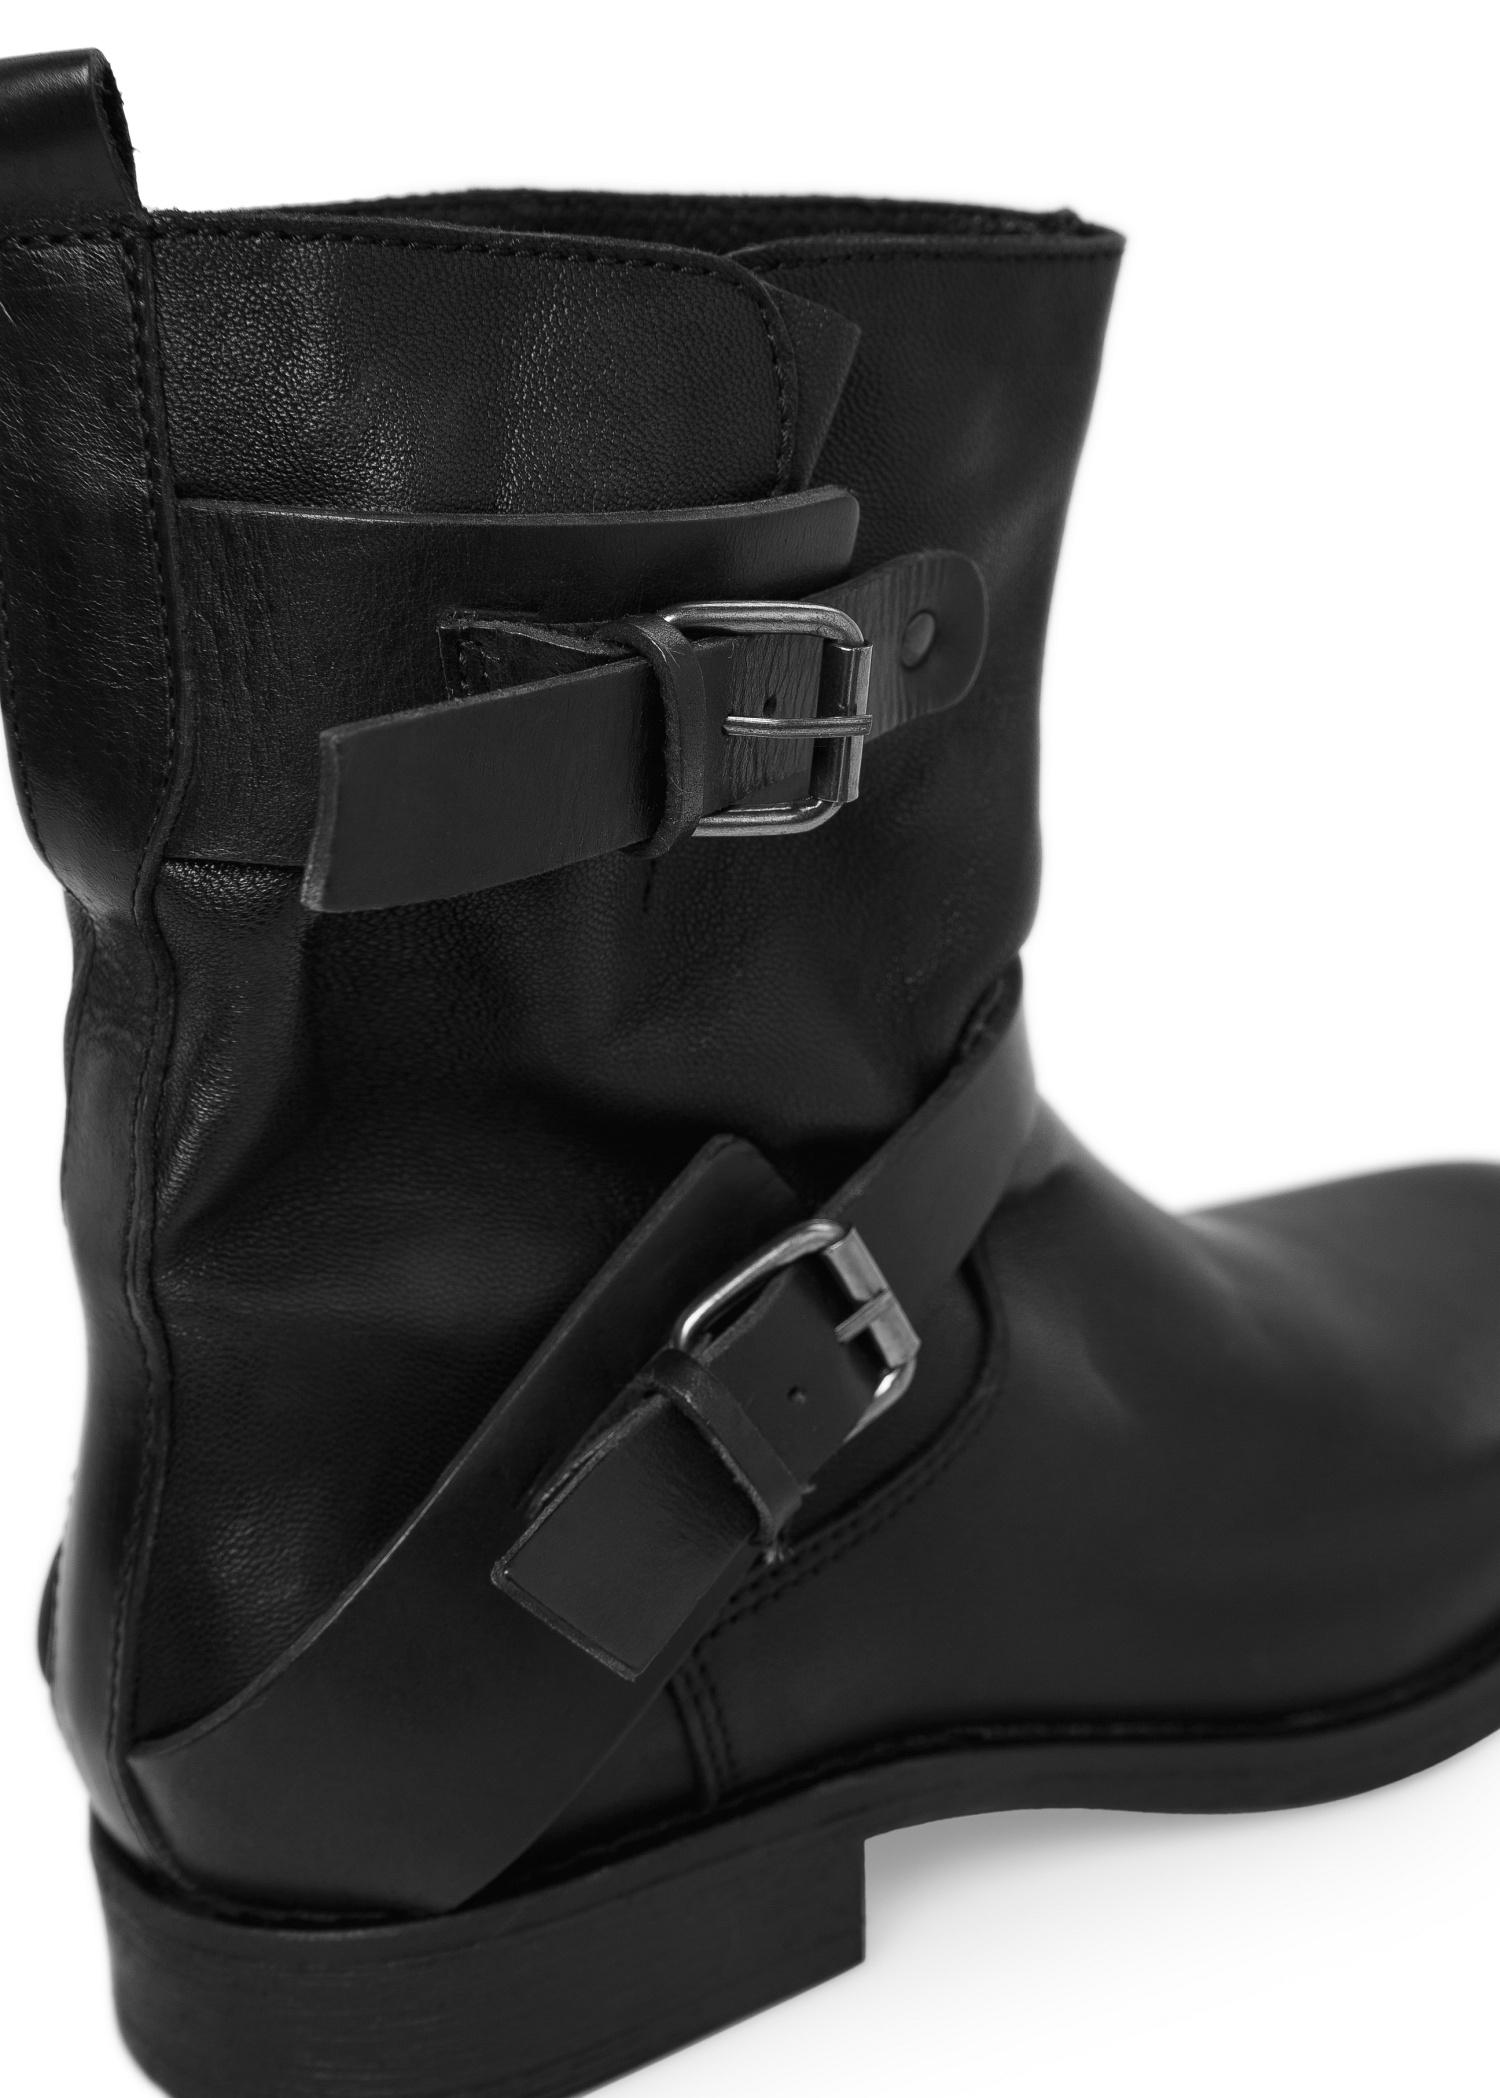 18f8bffb267 Mango Black Leather Biker Ankle Boots